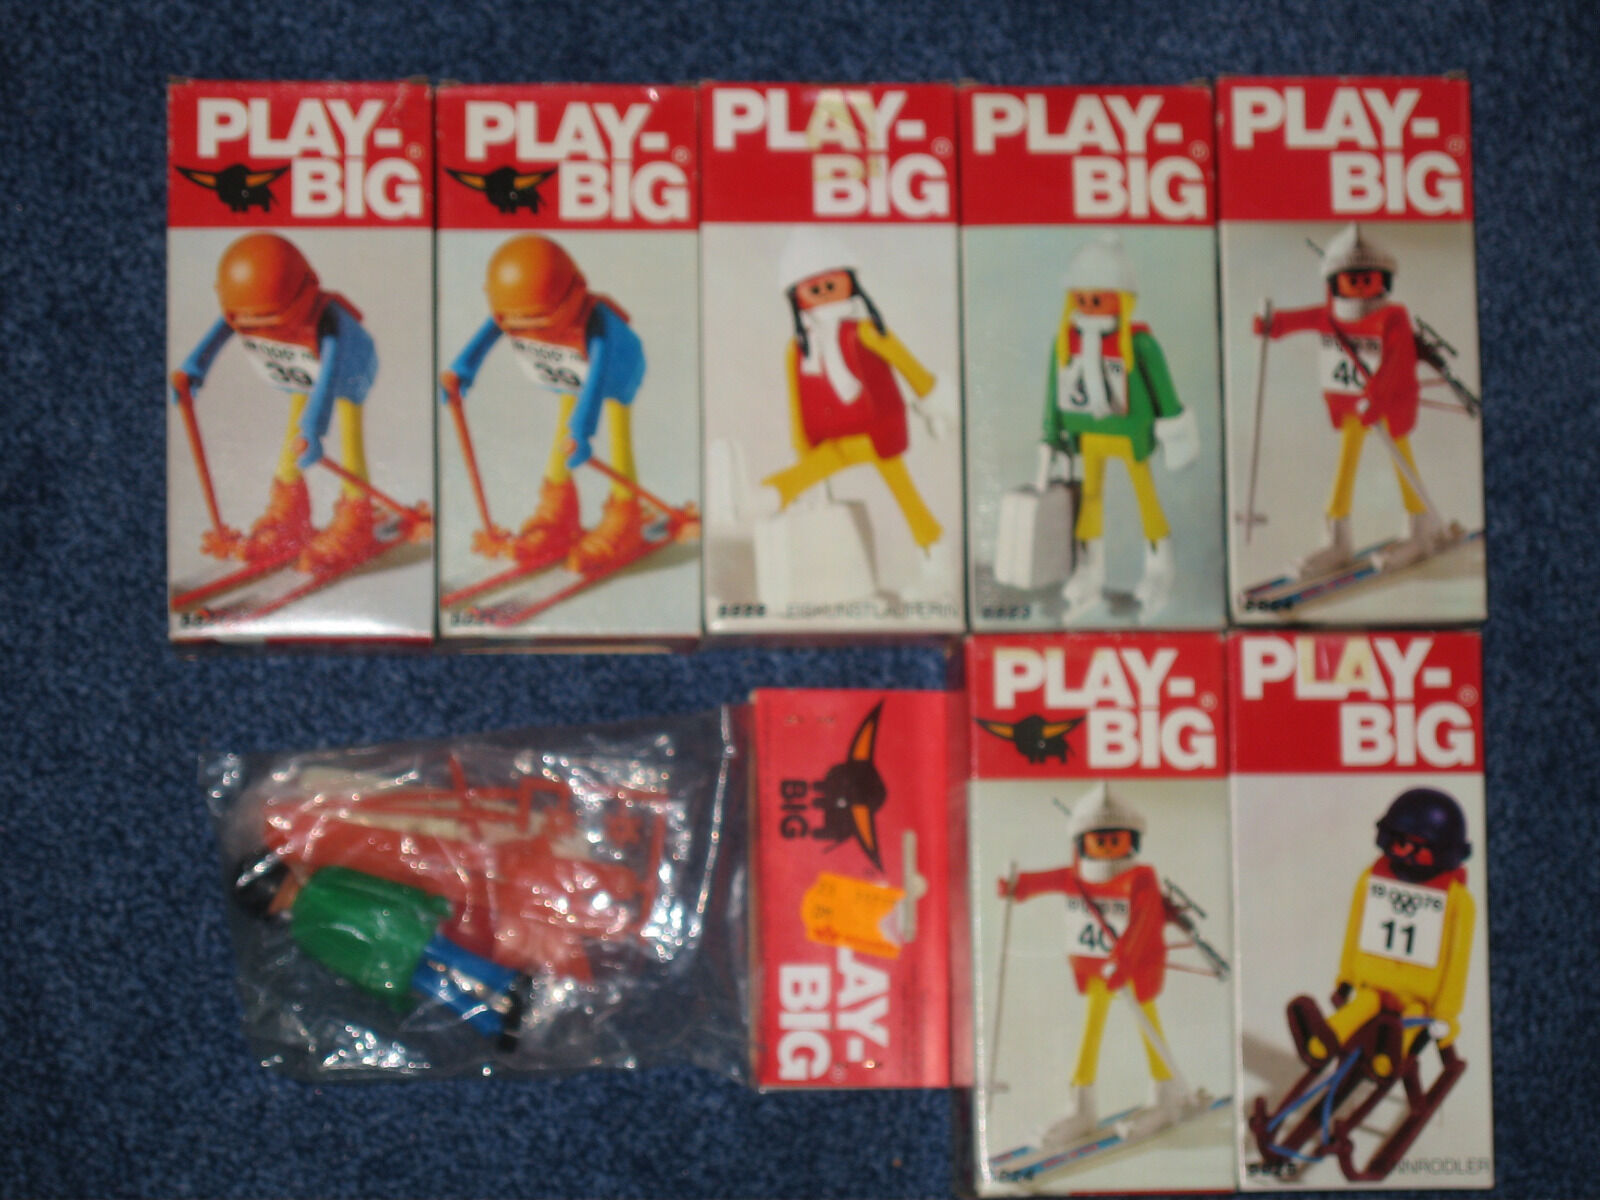 Auflösung großer Play Big Sammlung  hier 8 Sets Winter NEU OVP